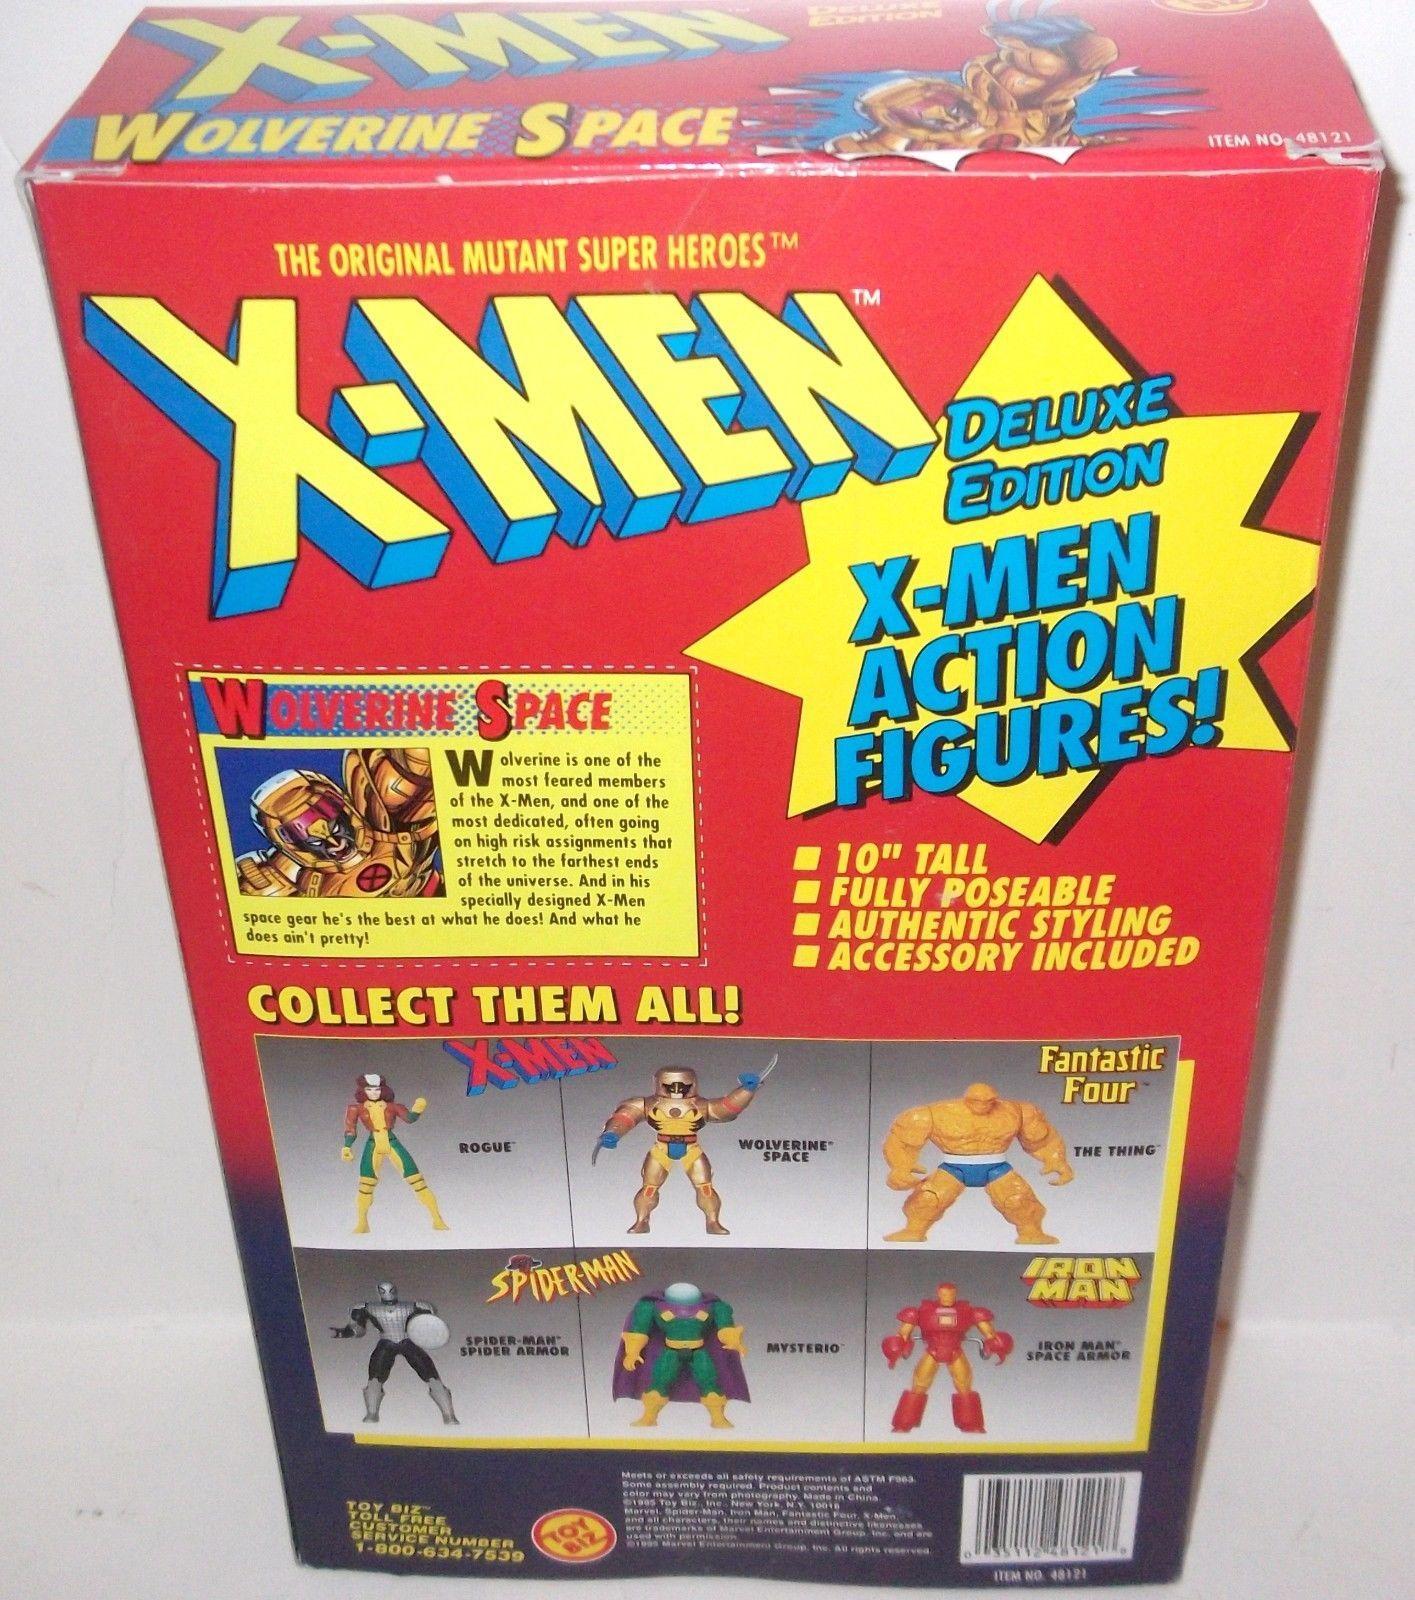 "MARVEL COMICS - X-MEN - DELUXE ED. WOLVERINE SPACE 10"" FIGURE - 1995 - MISB"